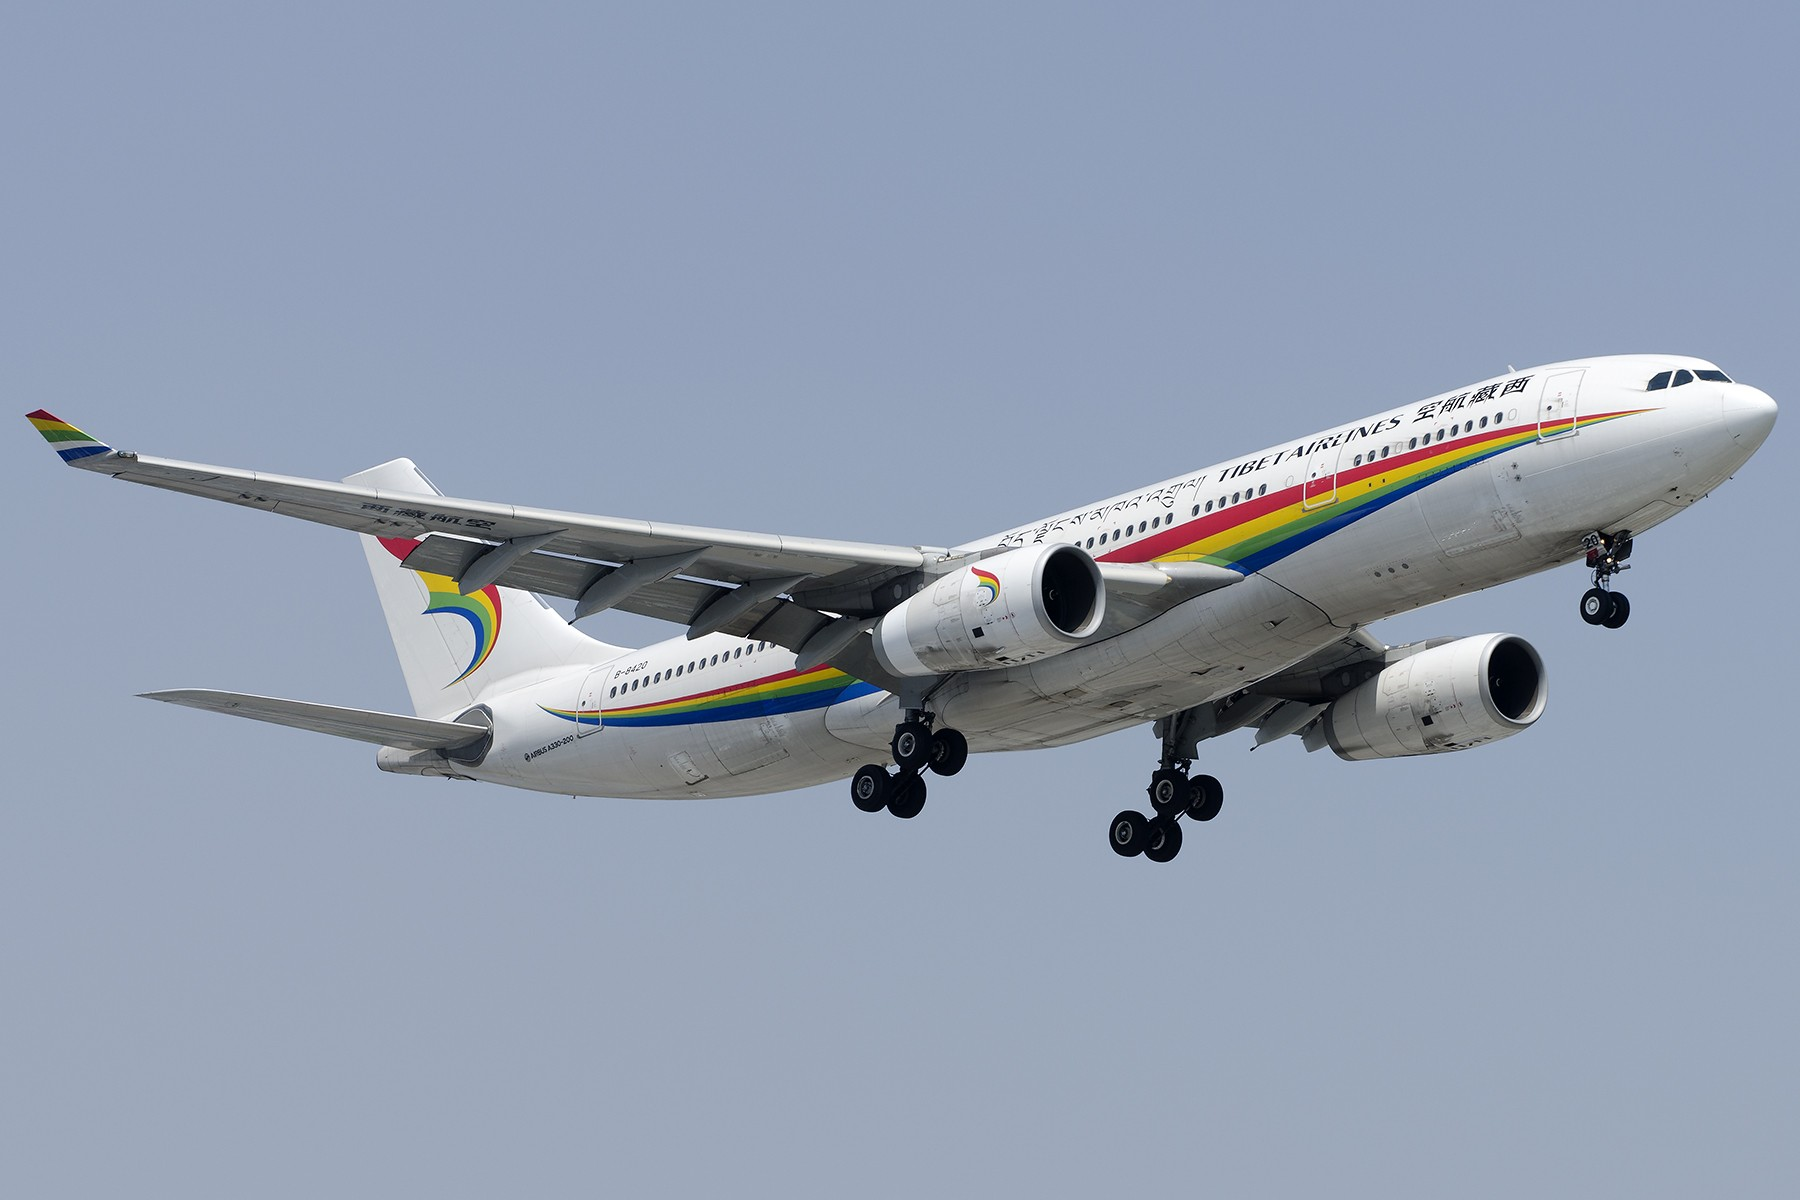 Re:[原创][原创]【SHA拍机*1800大图】4月拍的了,记得那天好货还挺多 AIRBUS A330-200 B-8420 中国上海虹桥国际机场